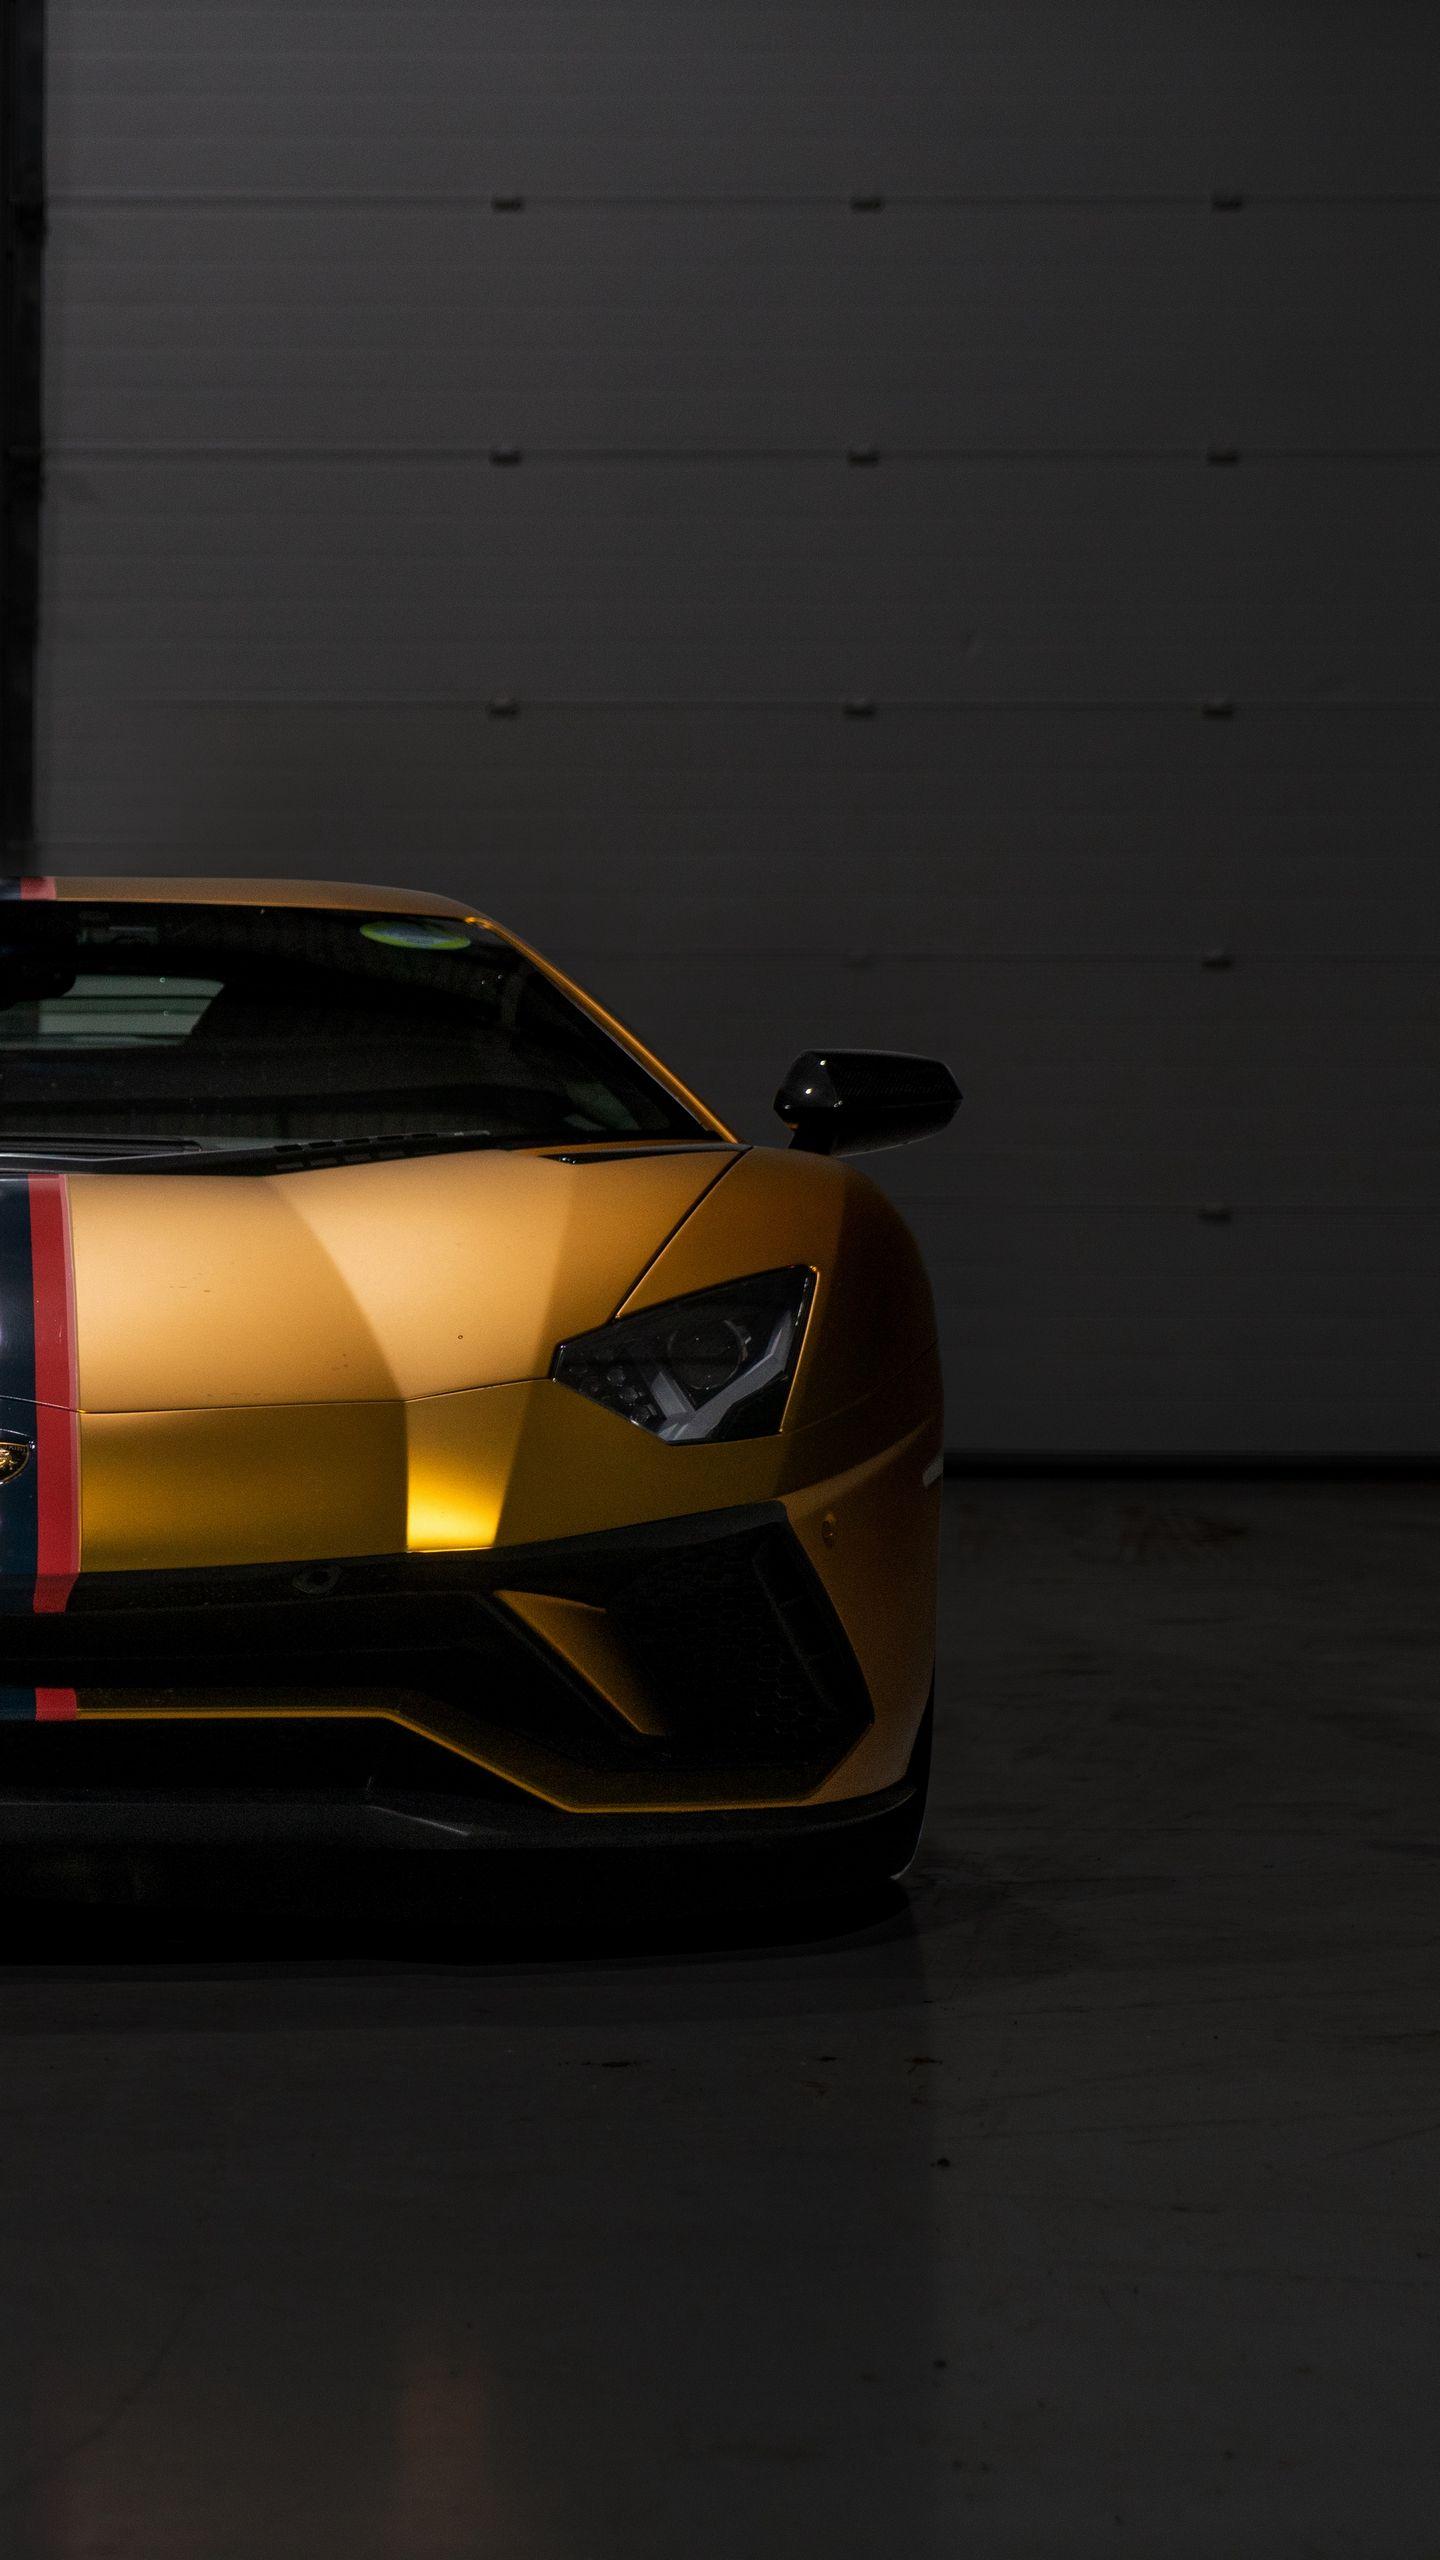 Whatsapp Wallpaper 076 Lamborghini Aventador Gold Wallpaper Hd 1440x2560 Wallpaper Teahub Io